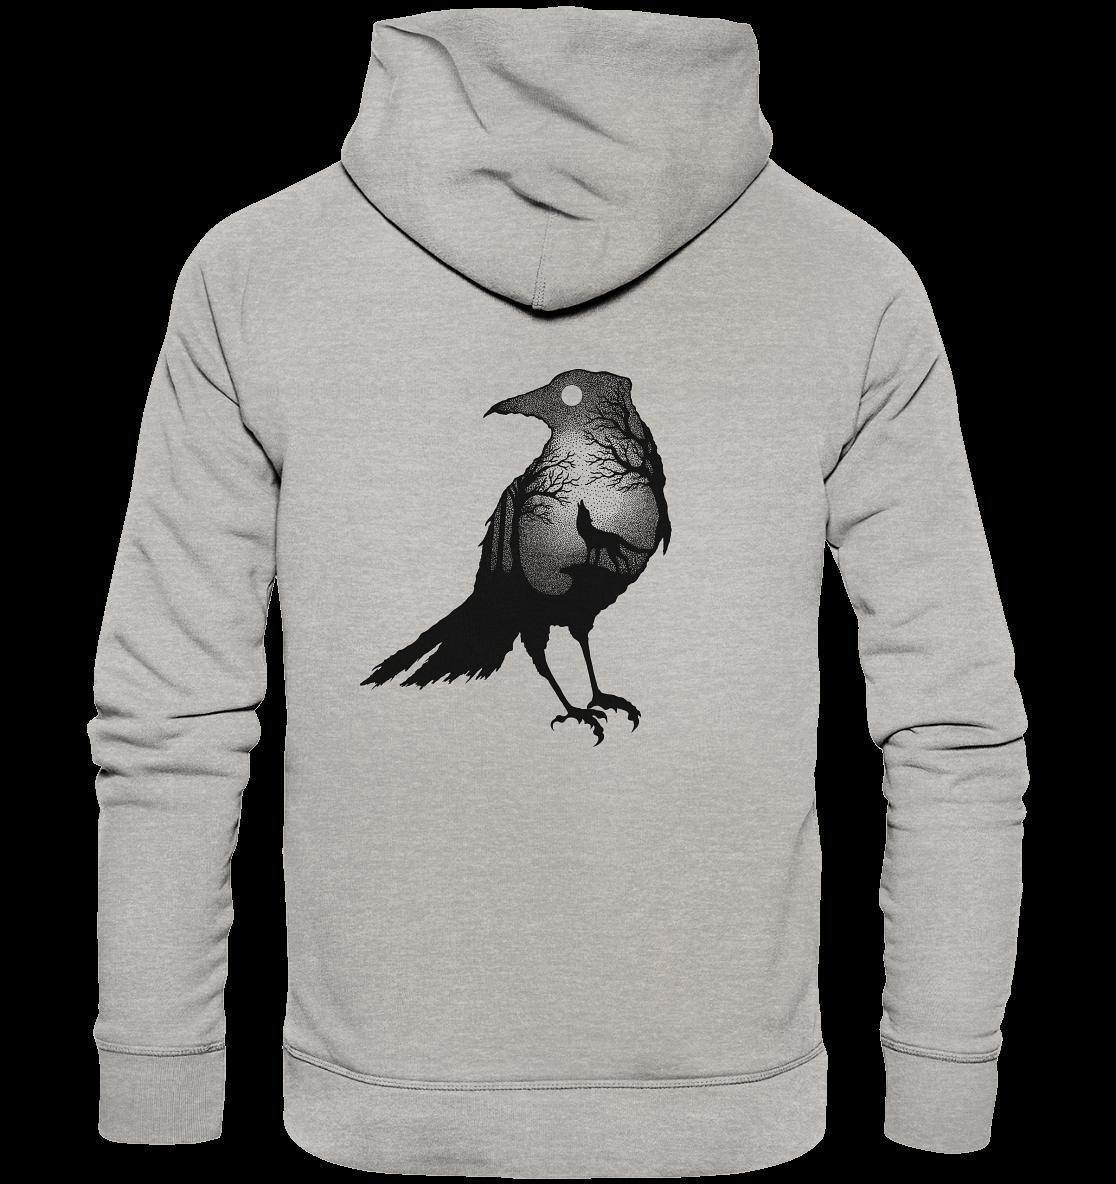 back-organic-fashion-hoodie-c2c1c0-1116x-2.png